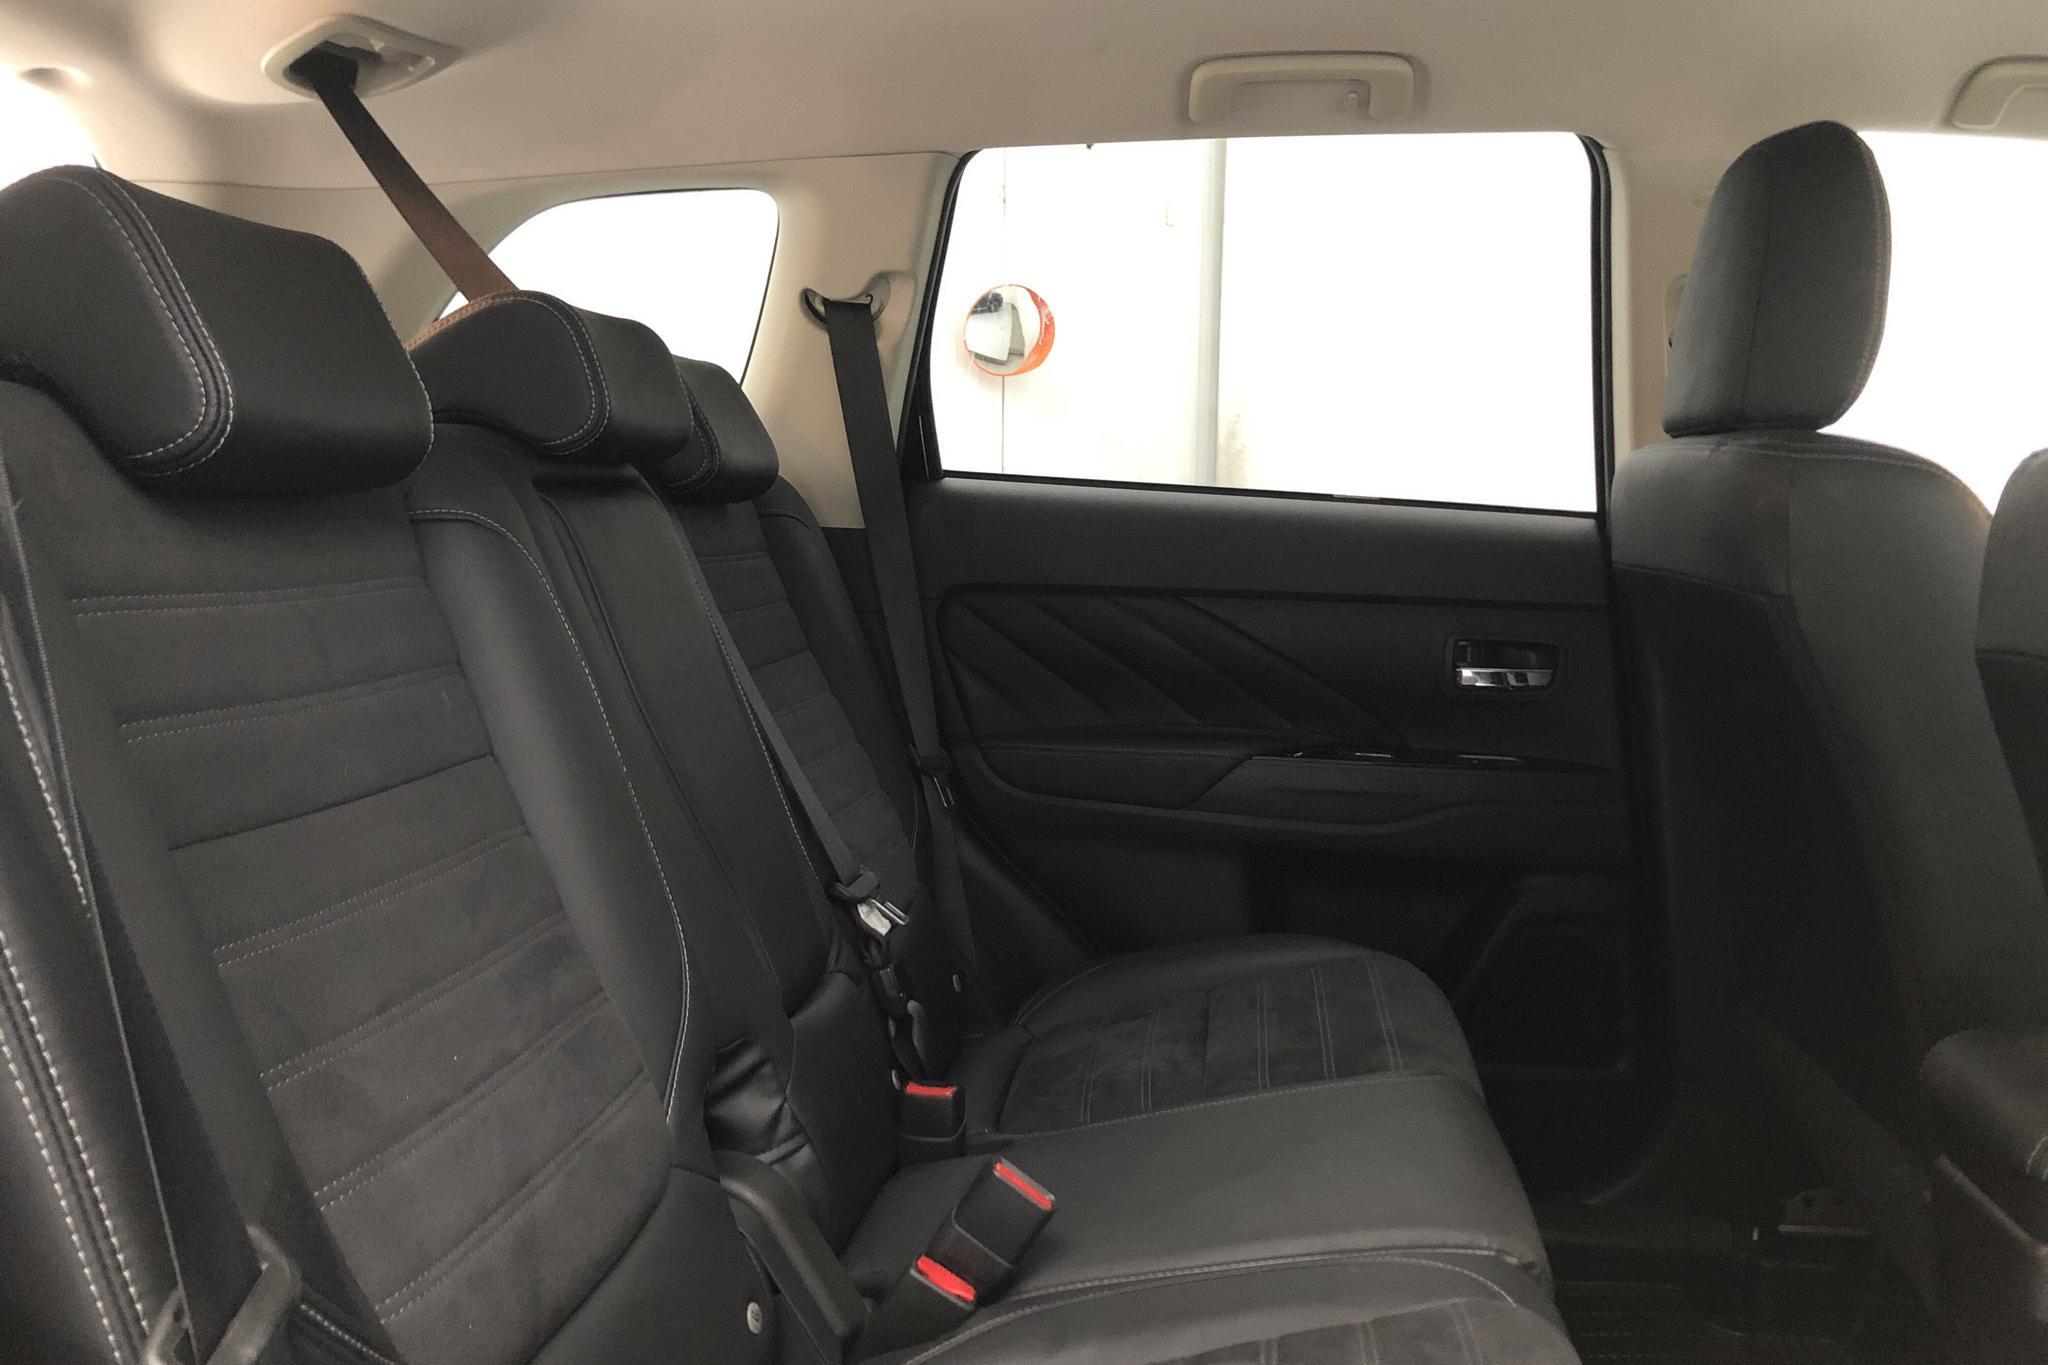 Mitsubishi Outlander 2.0 Plug-in Hybrid 4WD (121hk) - 59 010 km - Automatic - black - 2018